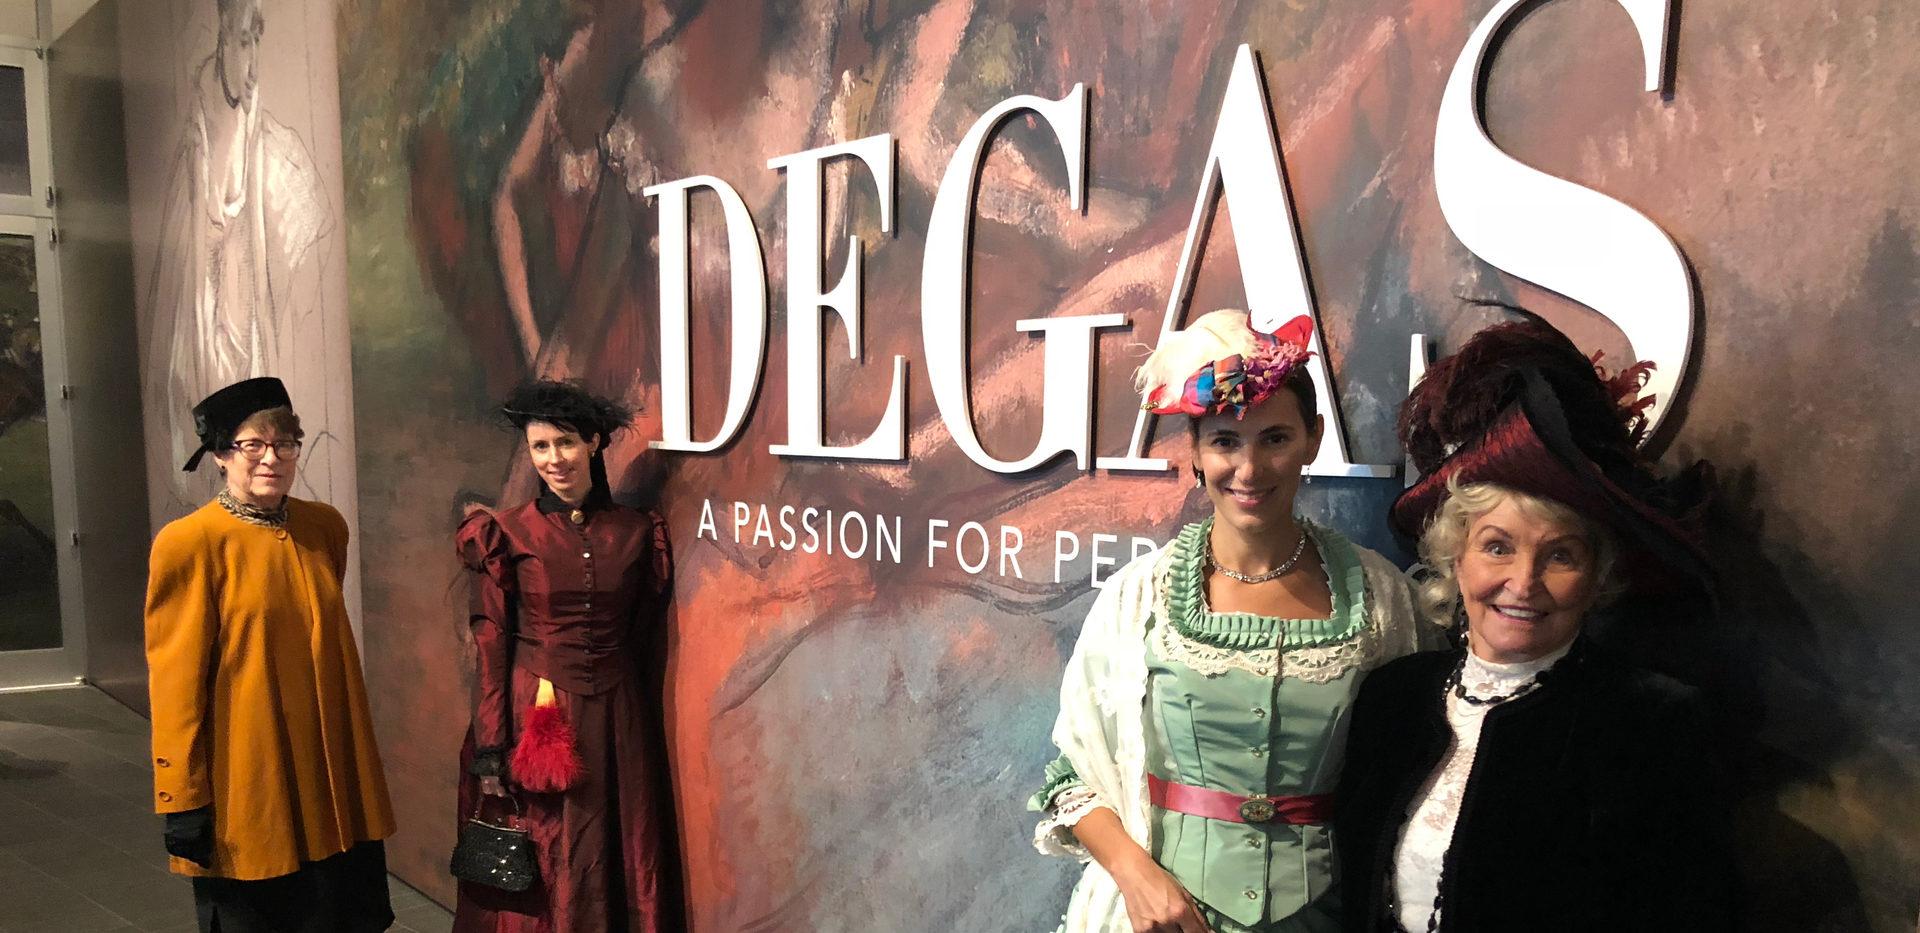 Degas Exhibit at the Denver Art Museum - Barbara Trick from Central City, Erin Niswender from Ft. Collins, Nico Nagel & Dottie Bakke